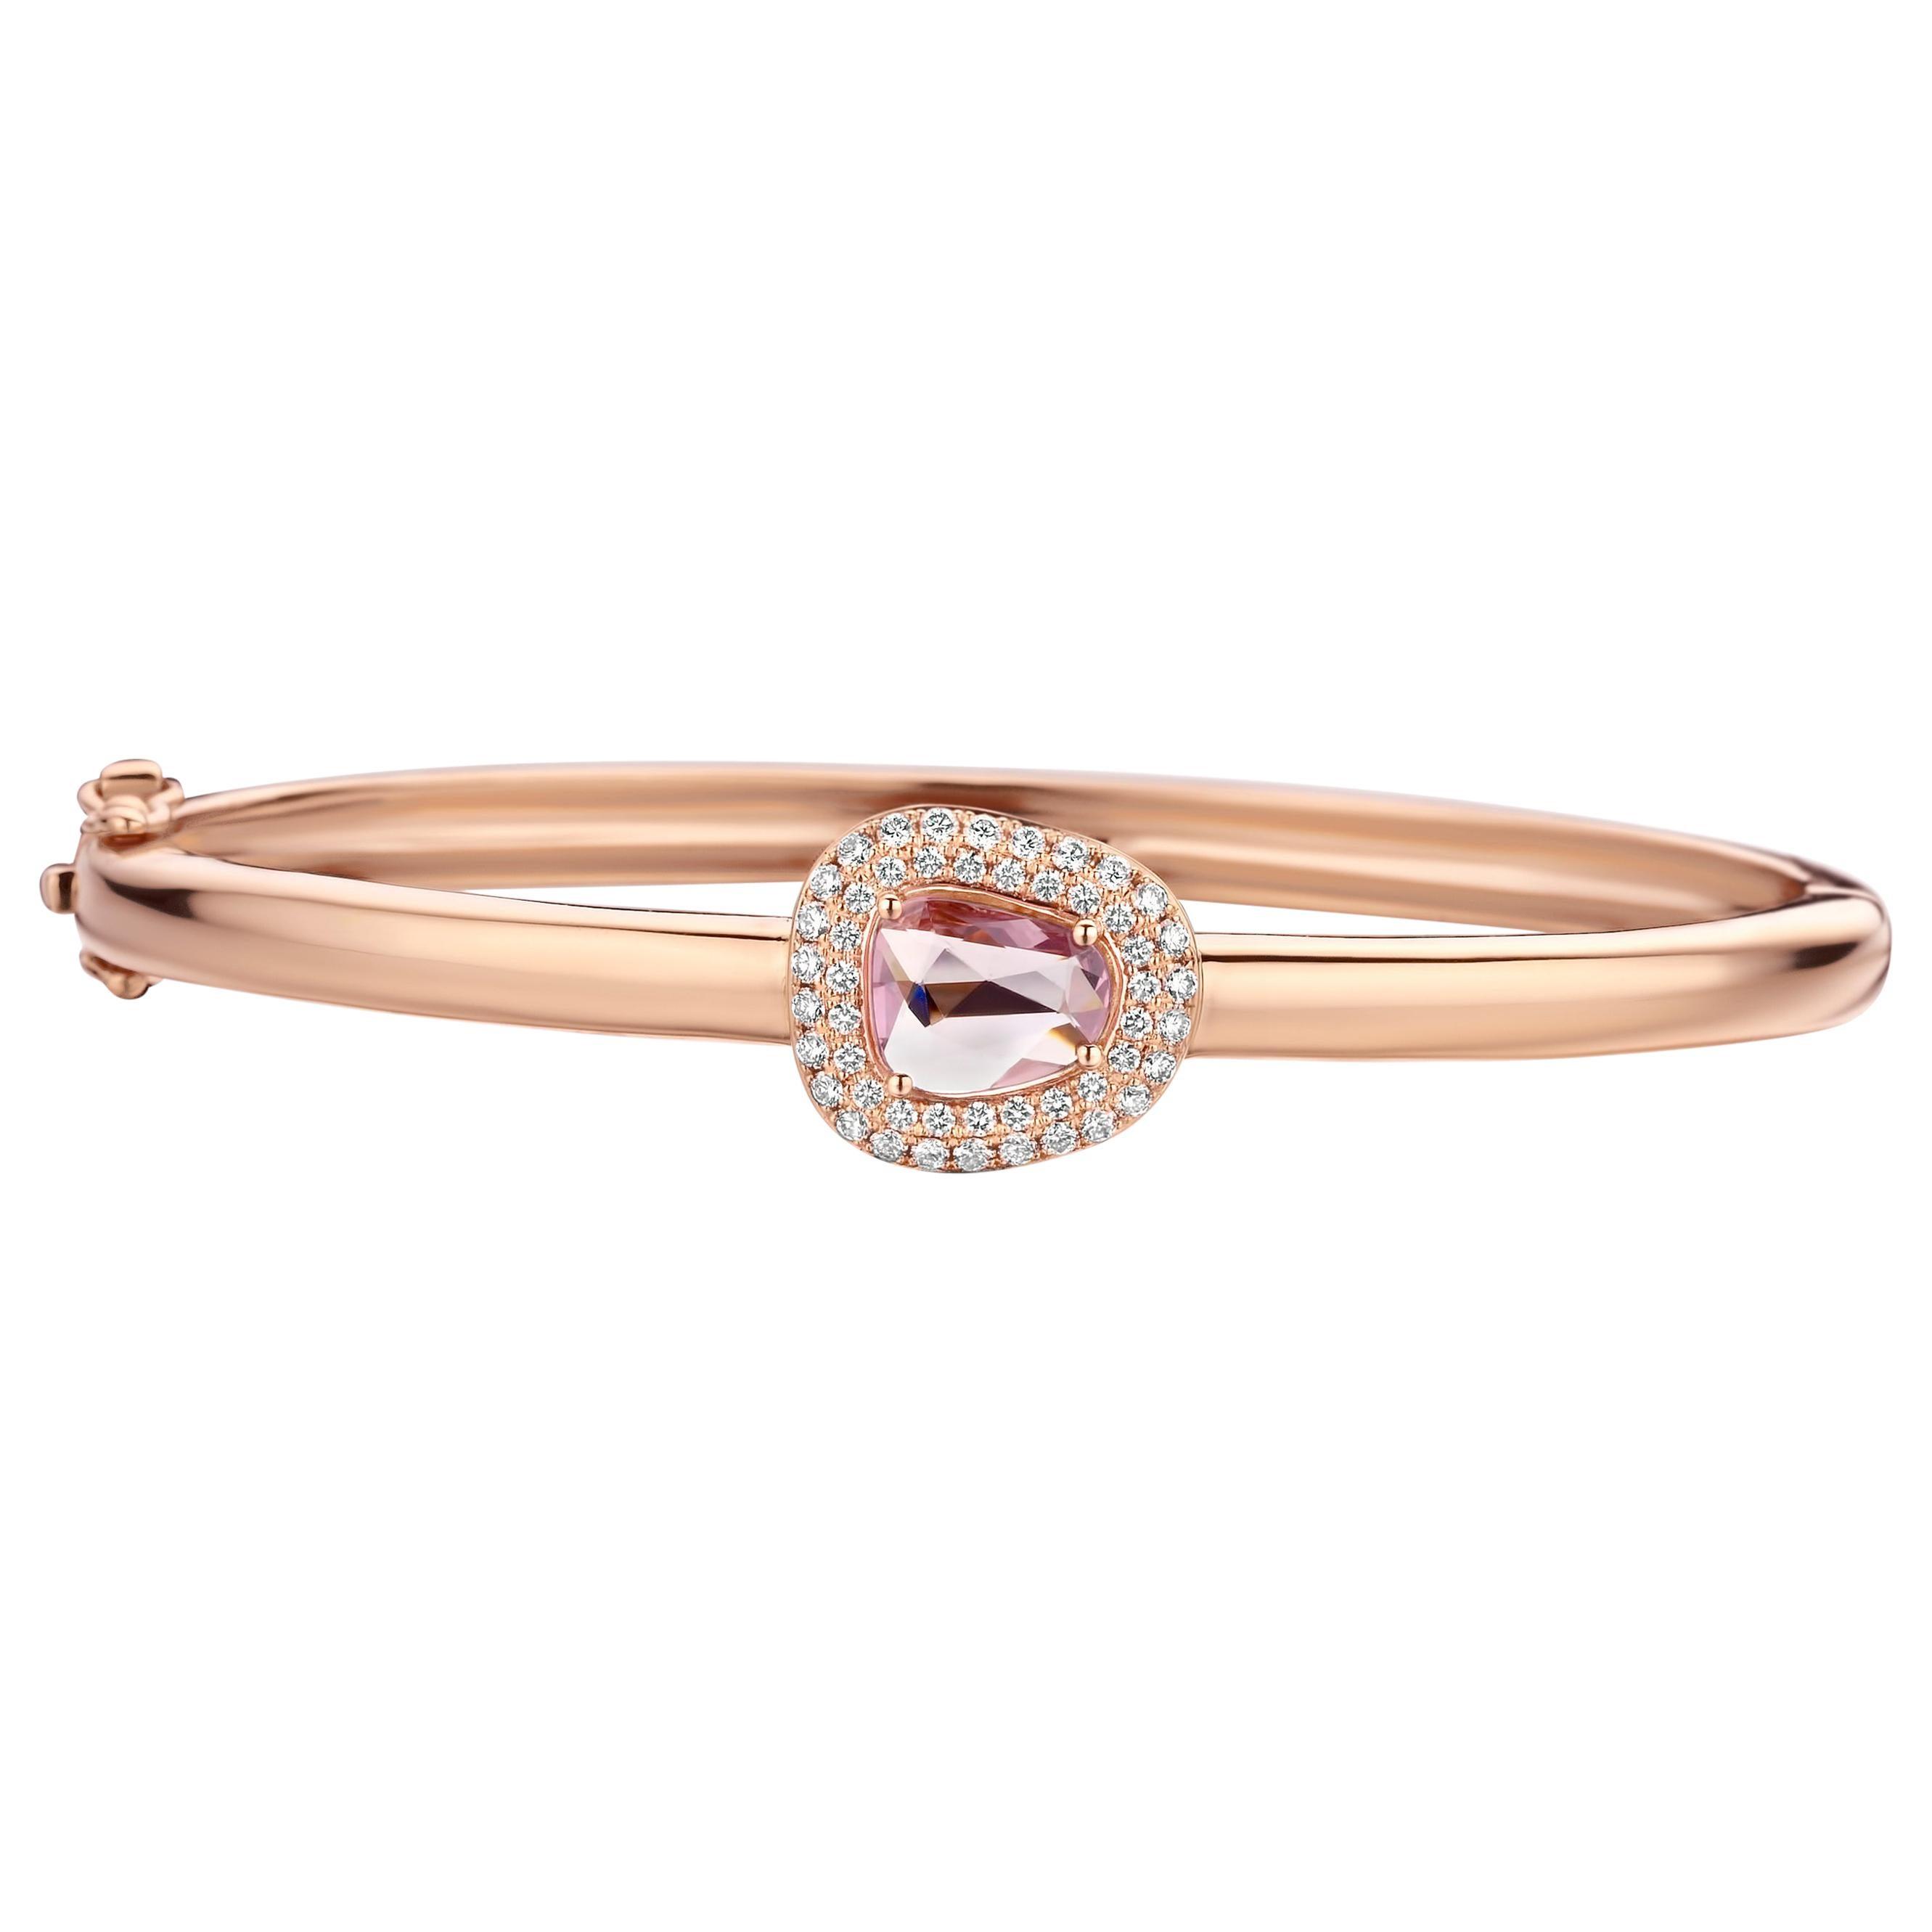 1.16 Carat Pink Sapphire 18 Karat Cluster Diamond Bangle